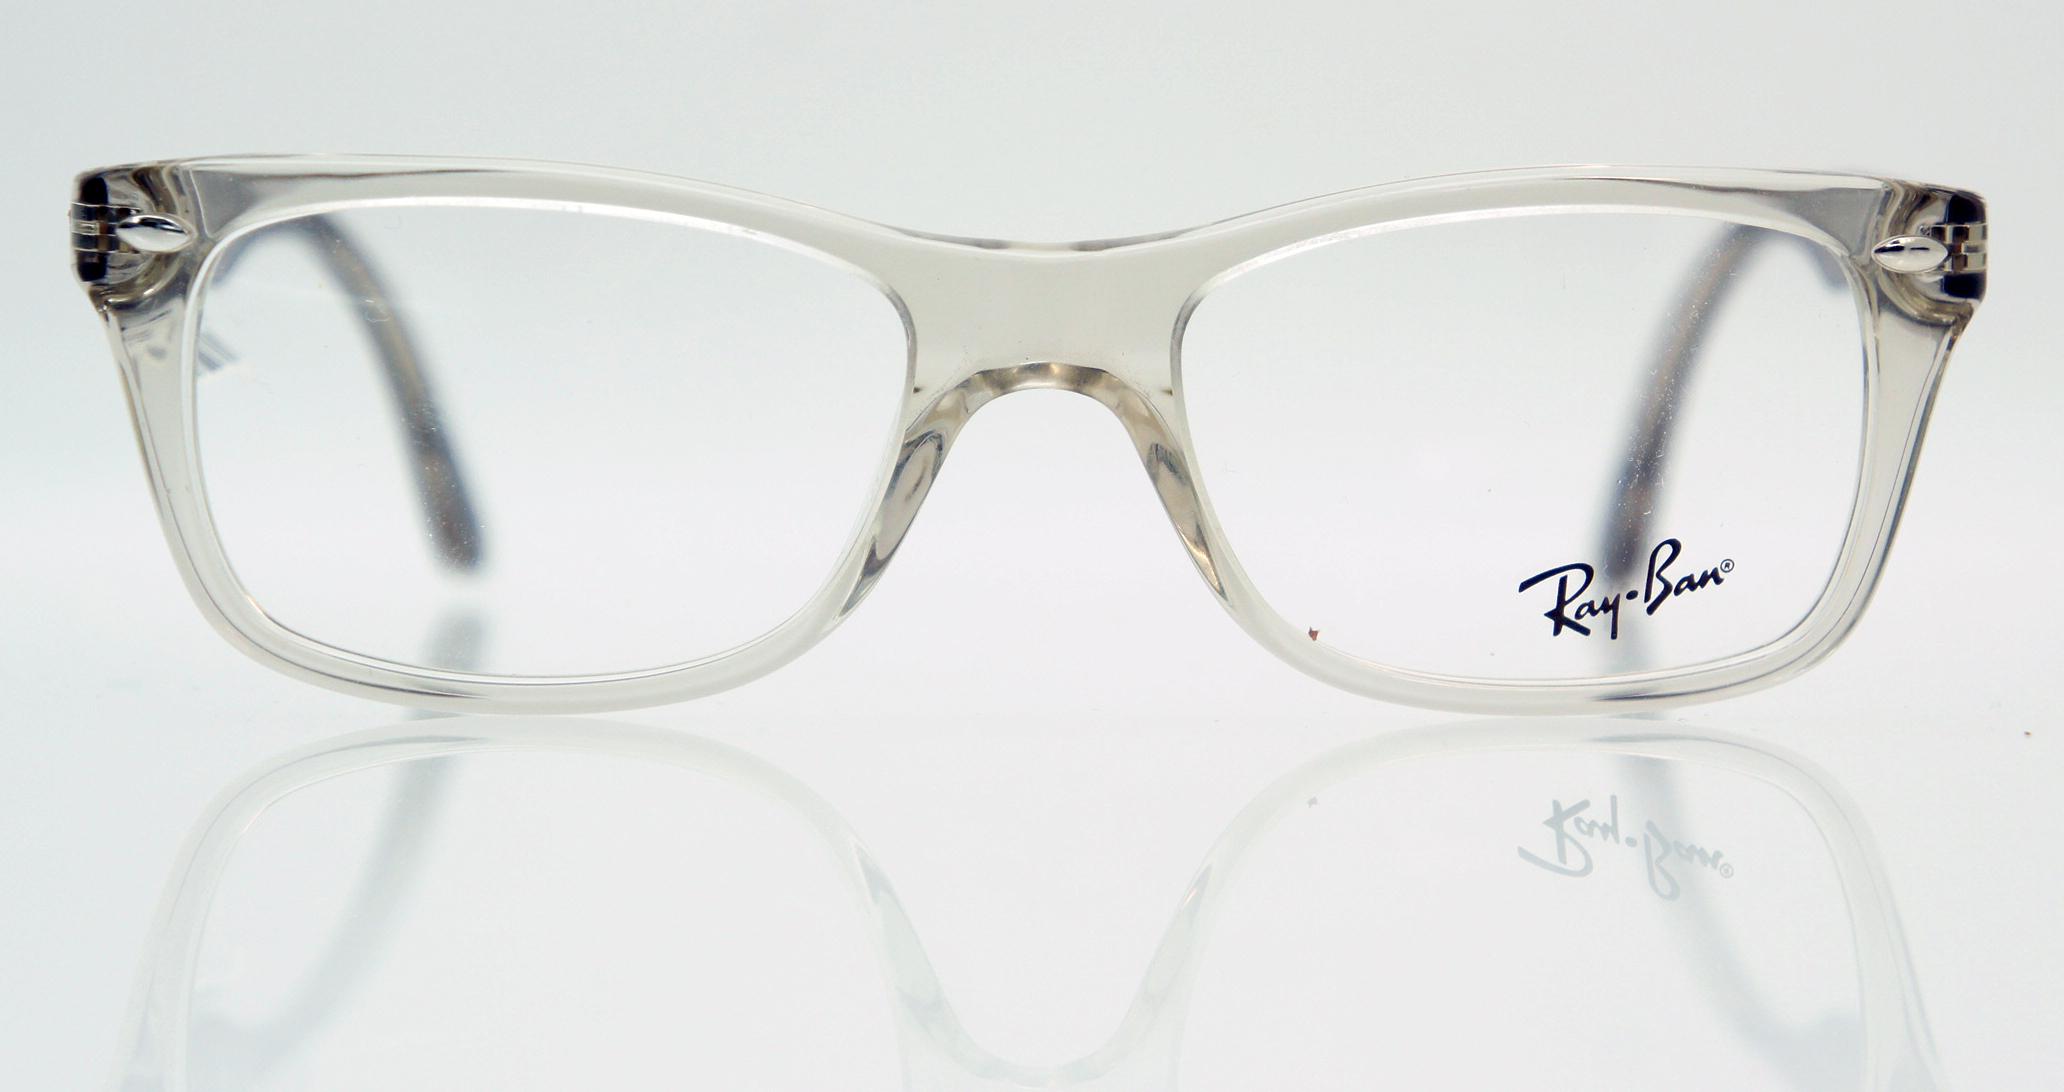 ray ban brille brillen gestell rb 5228 5234 50 17 140. Black Bedroom Furniture Sets. Home Design Ideas